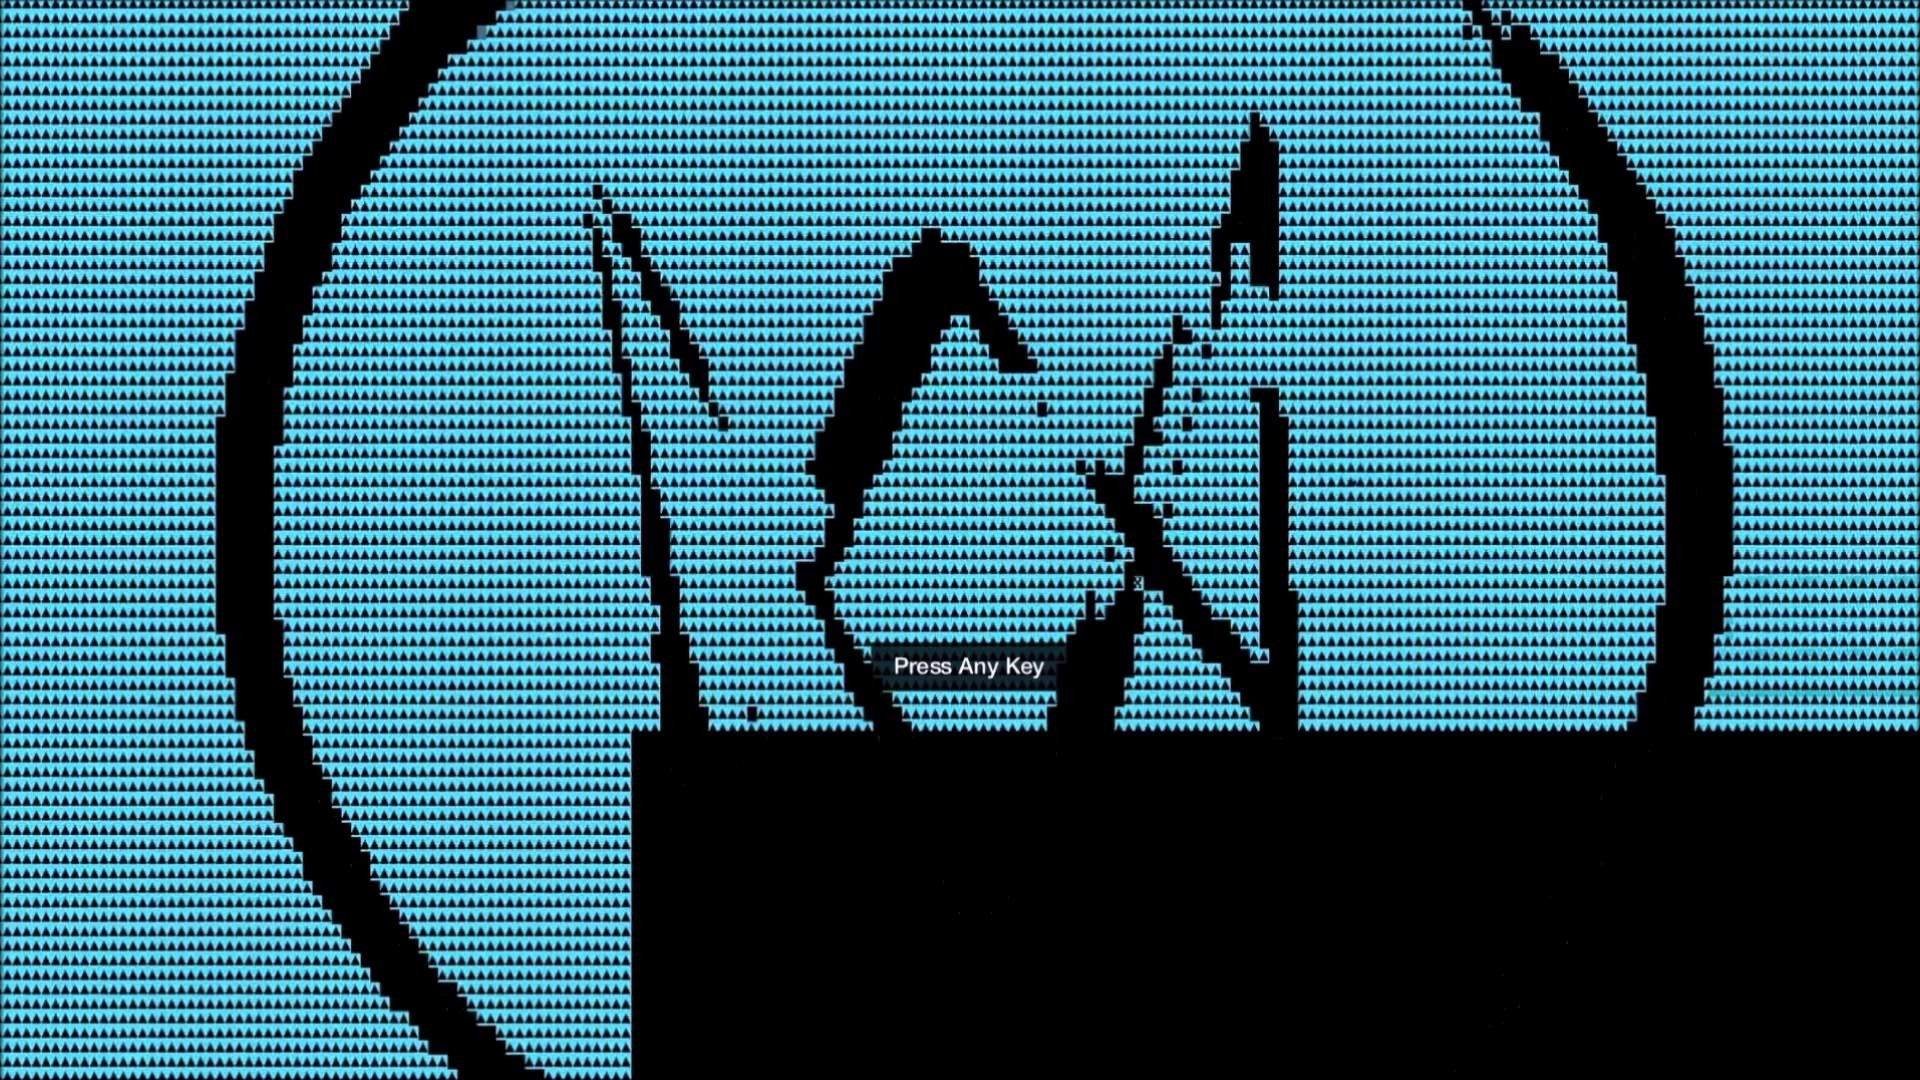 Assassins Creed 2 Wallpaper Hd 1080p Watch Dogs Logo Wallpaper 77 Images